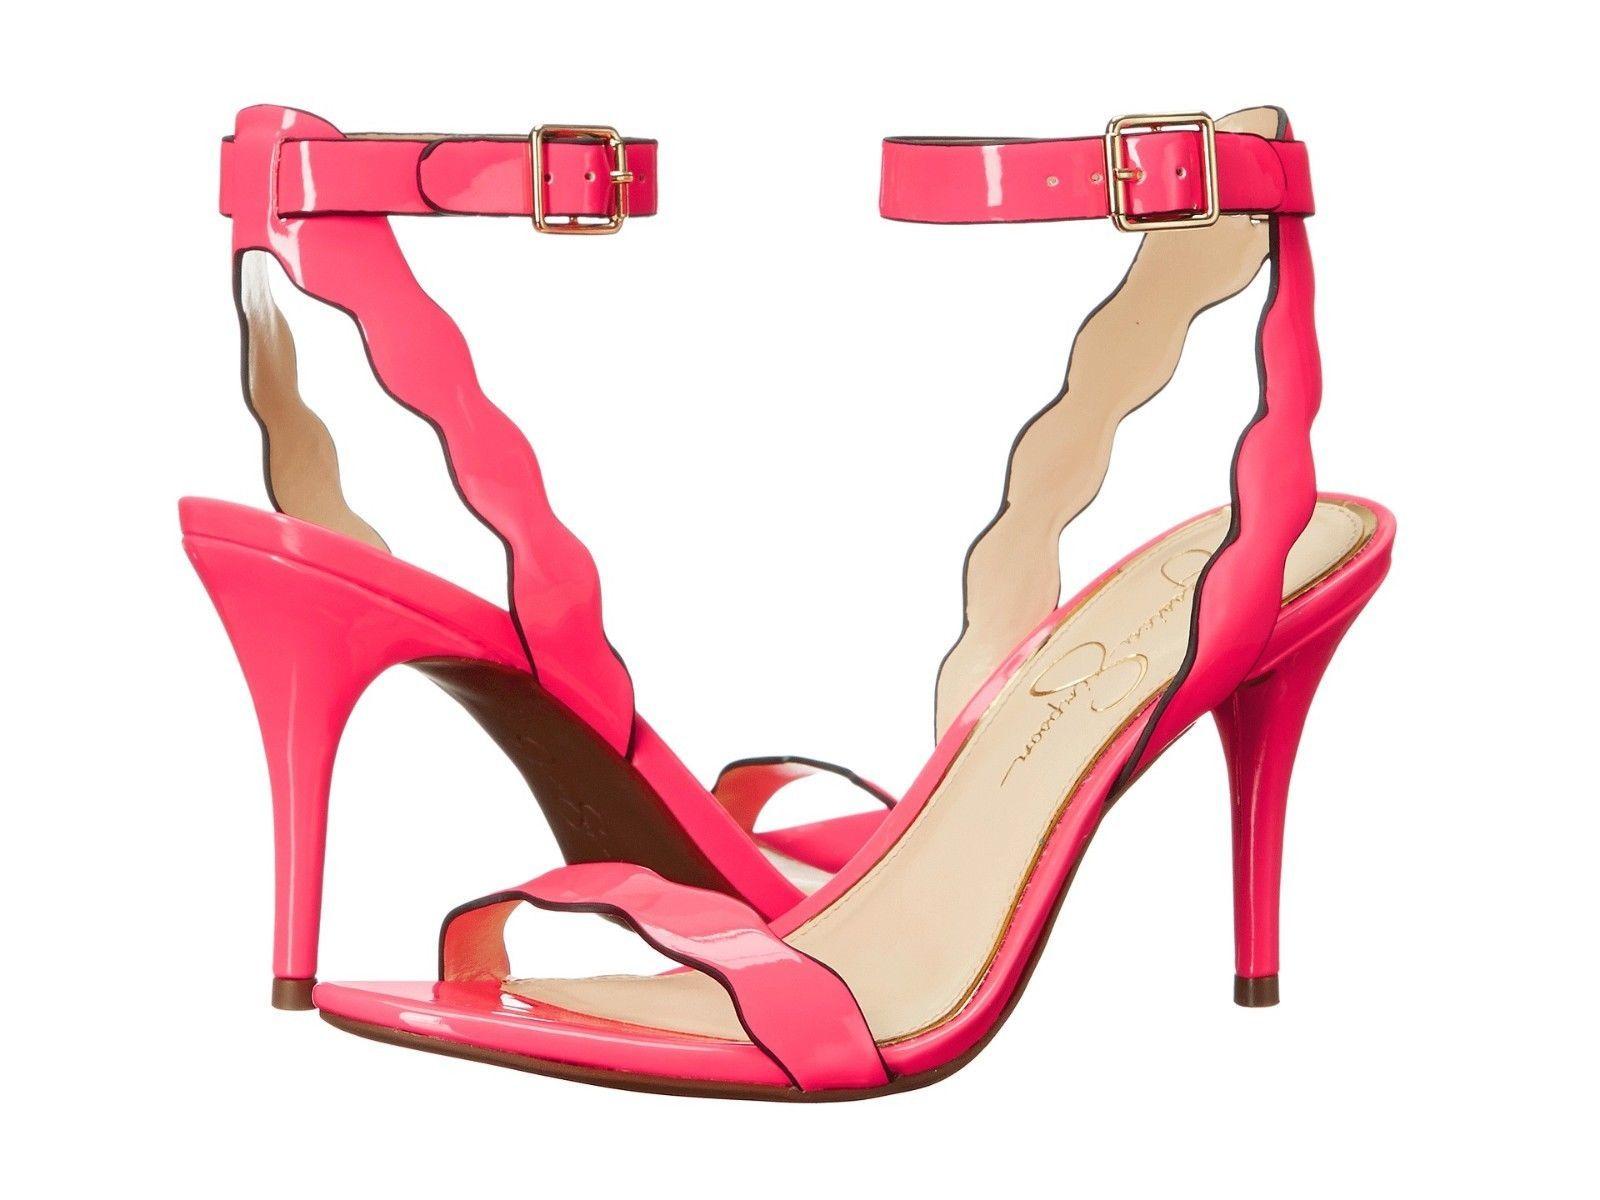 91662901d8b Women's Jessica Simpson Morena Sandals, and 50 similar items